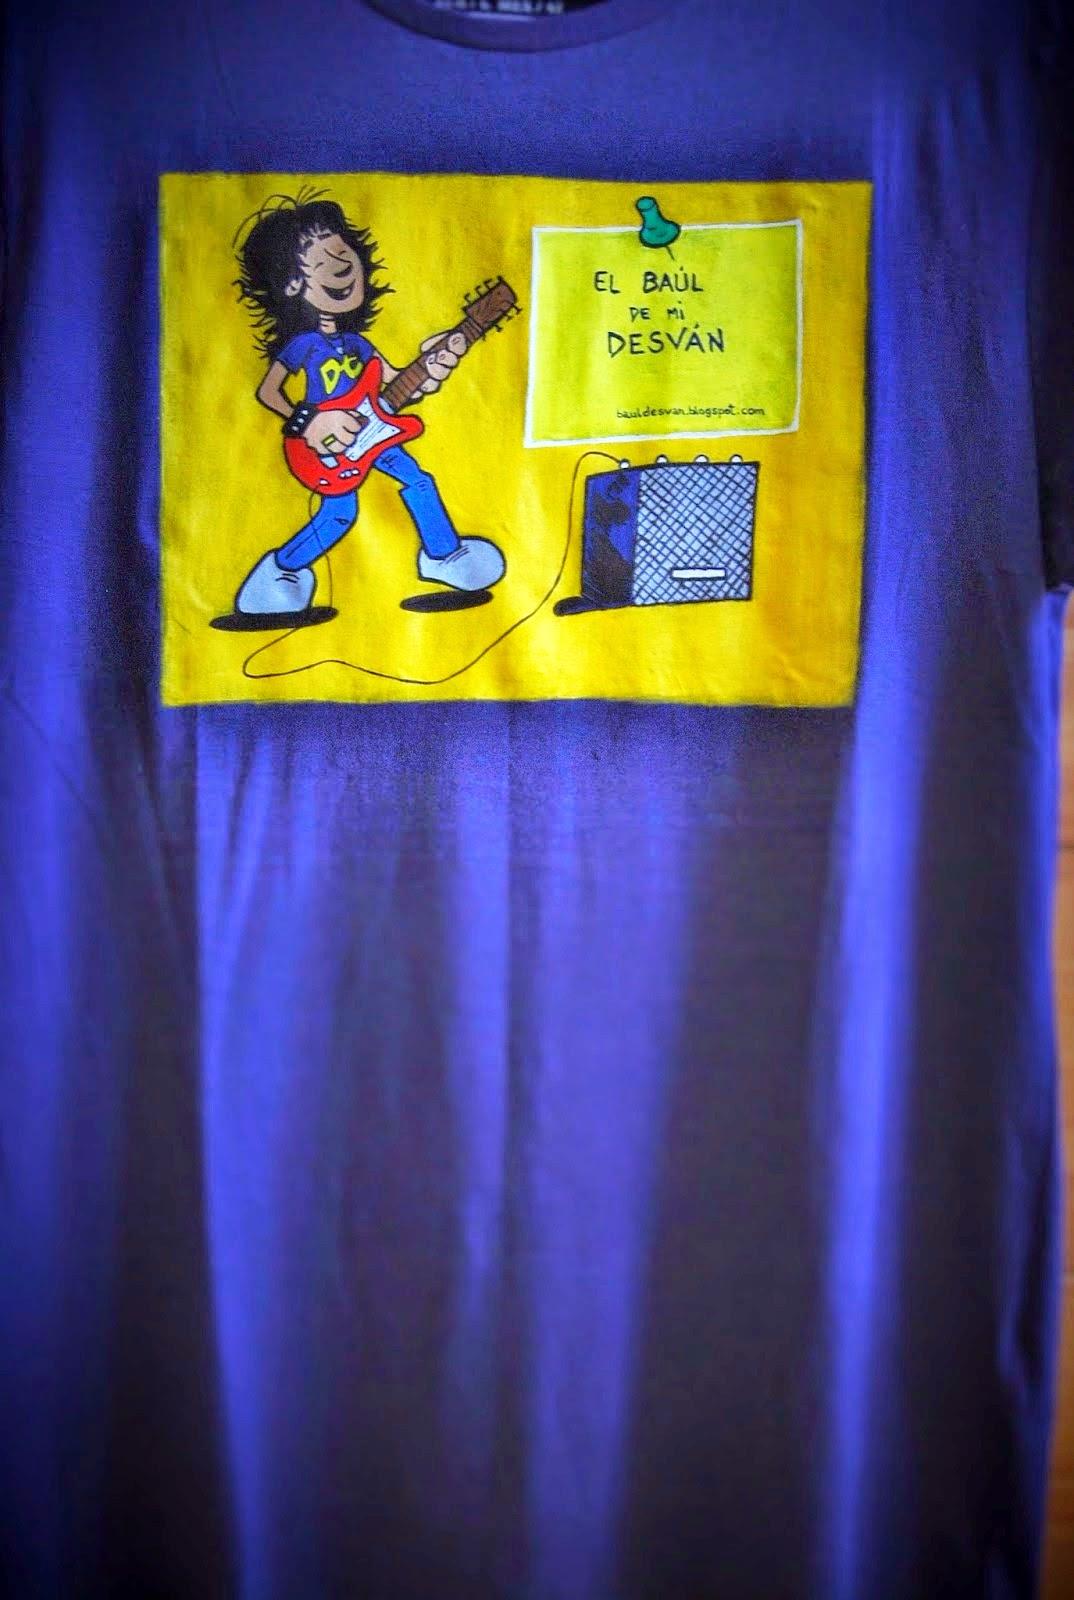 La camiseta del blog